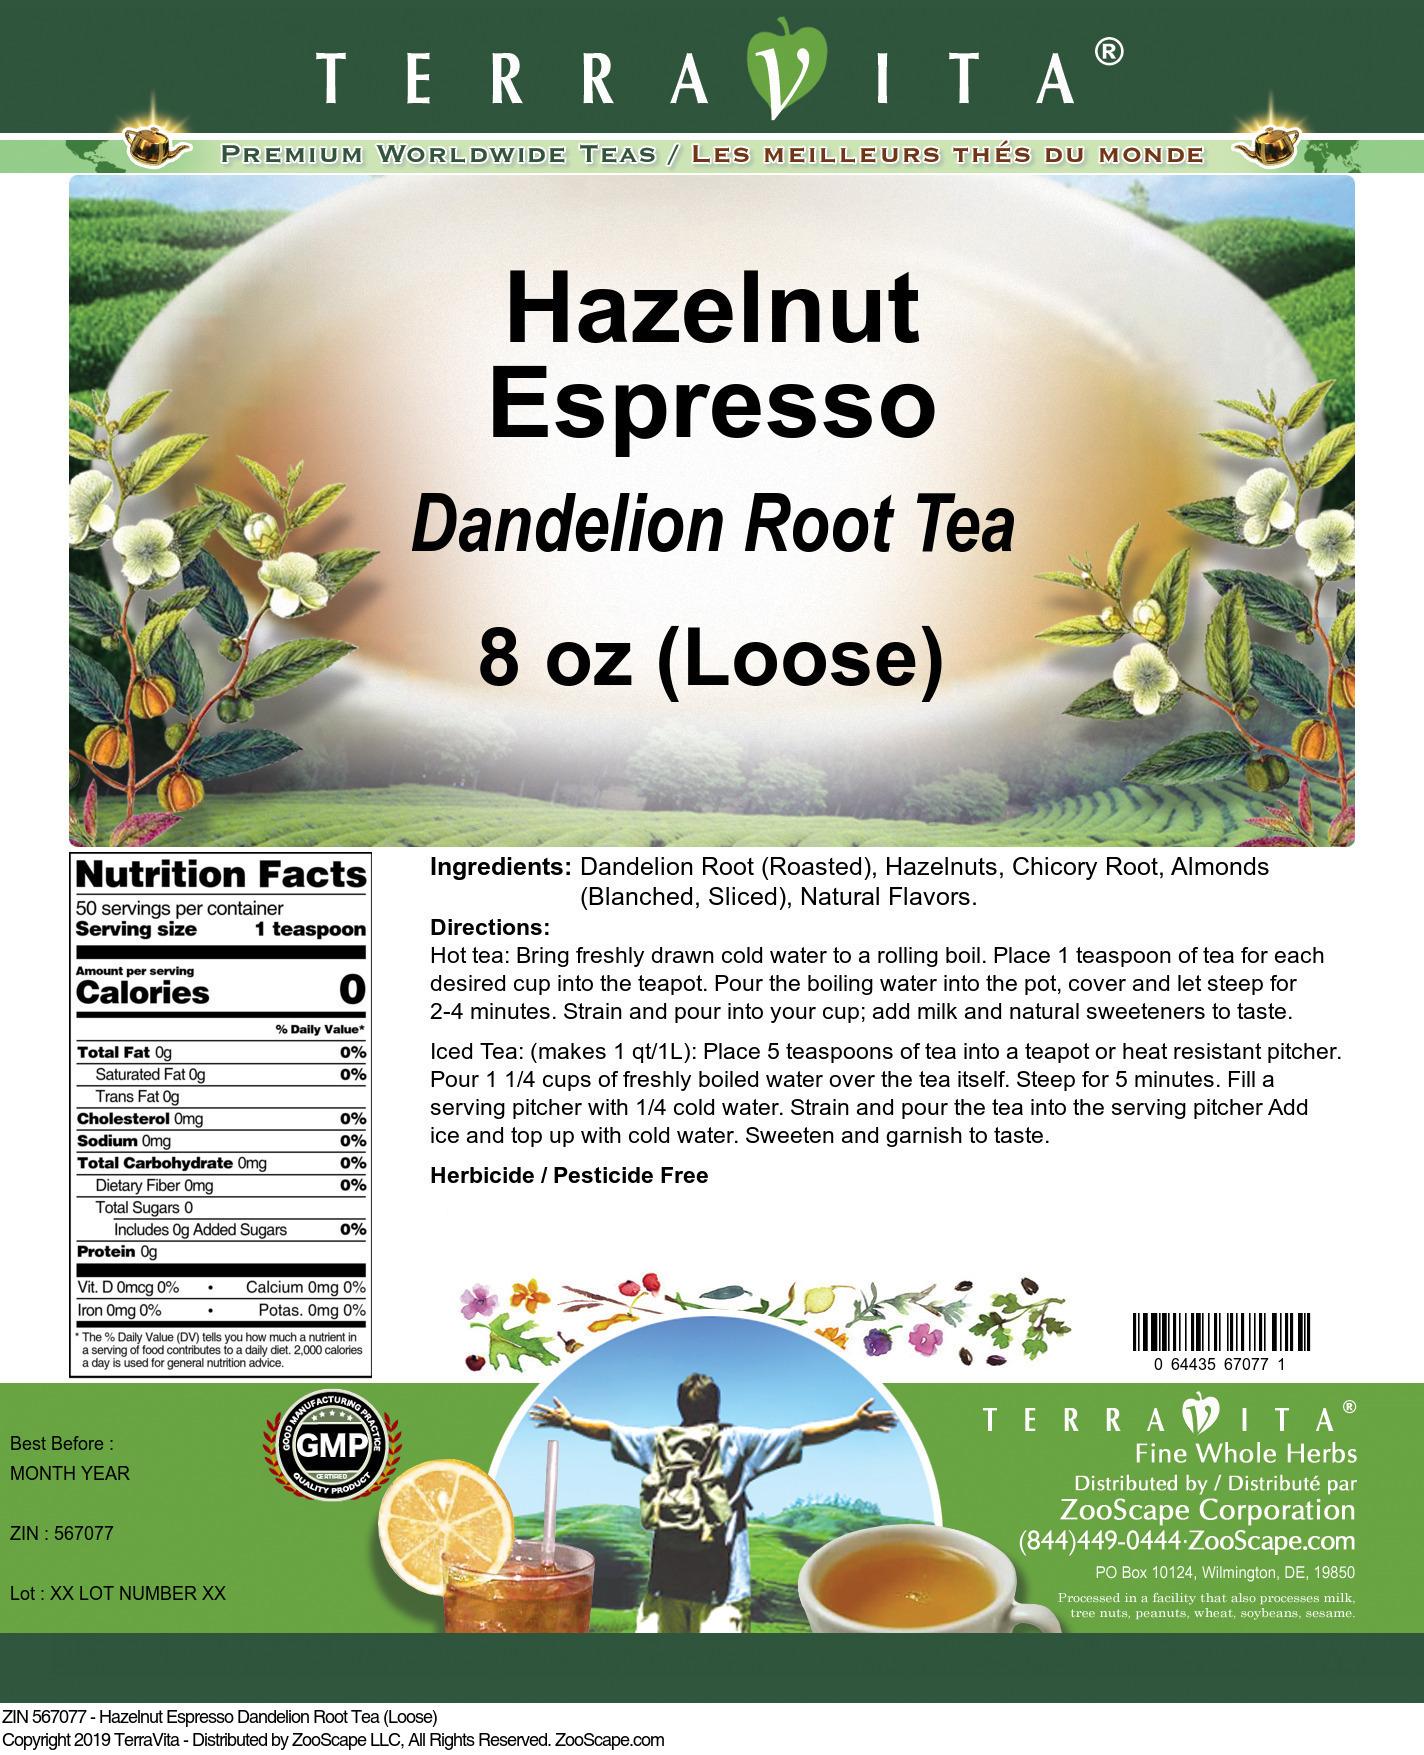 Hazelnut Espresso Dandelion Root